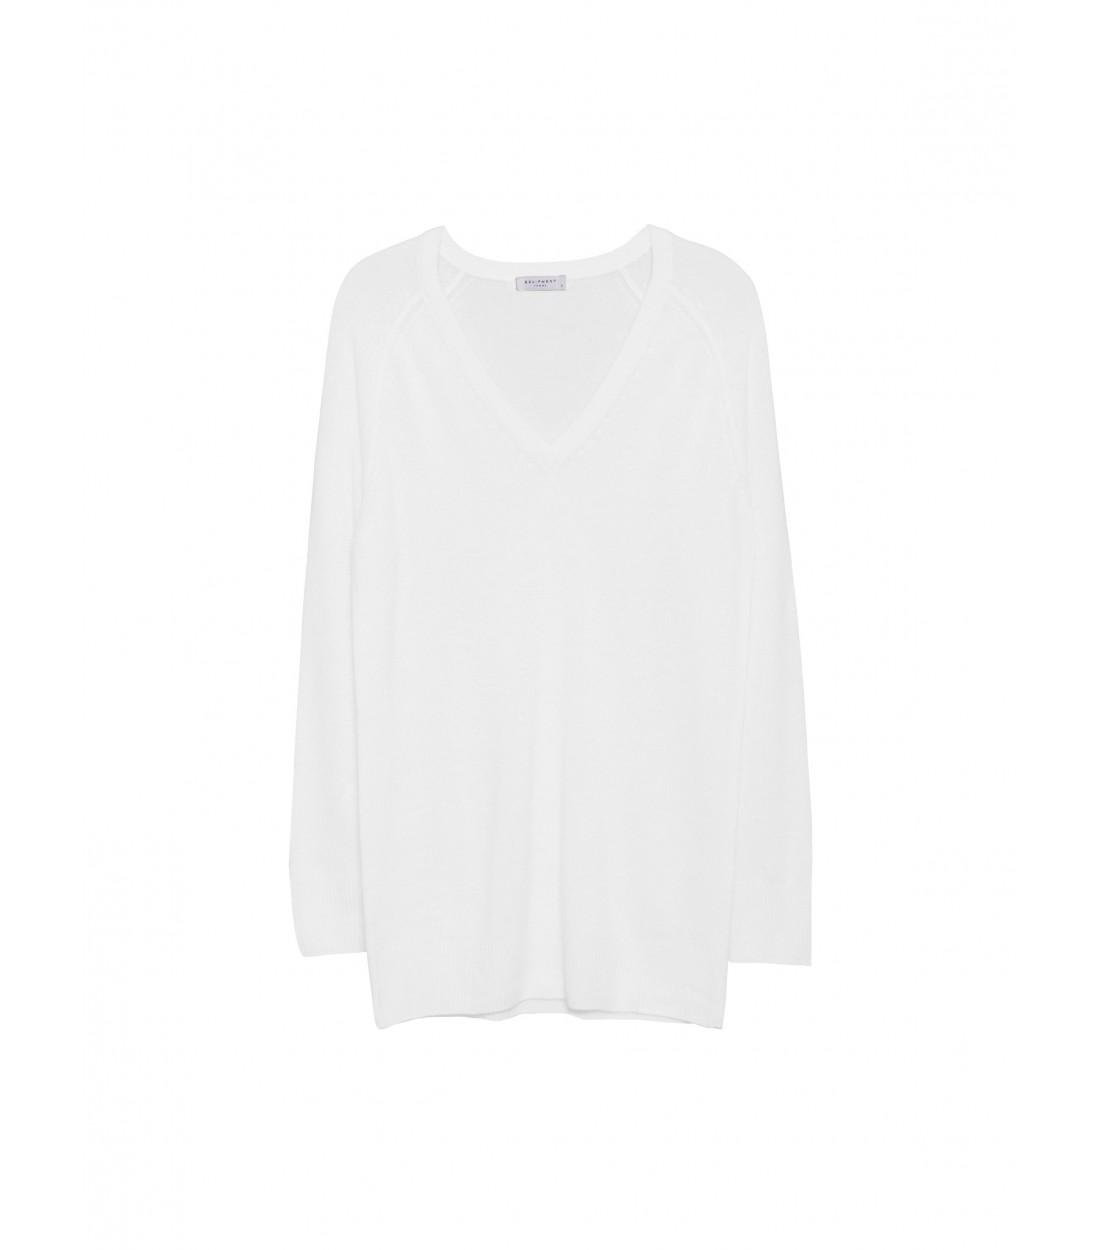 EQUIPMENT Asher V-Neck Ivory   Women's Cashmere Sweater